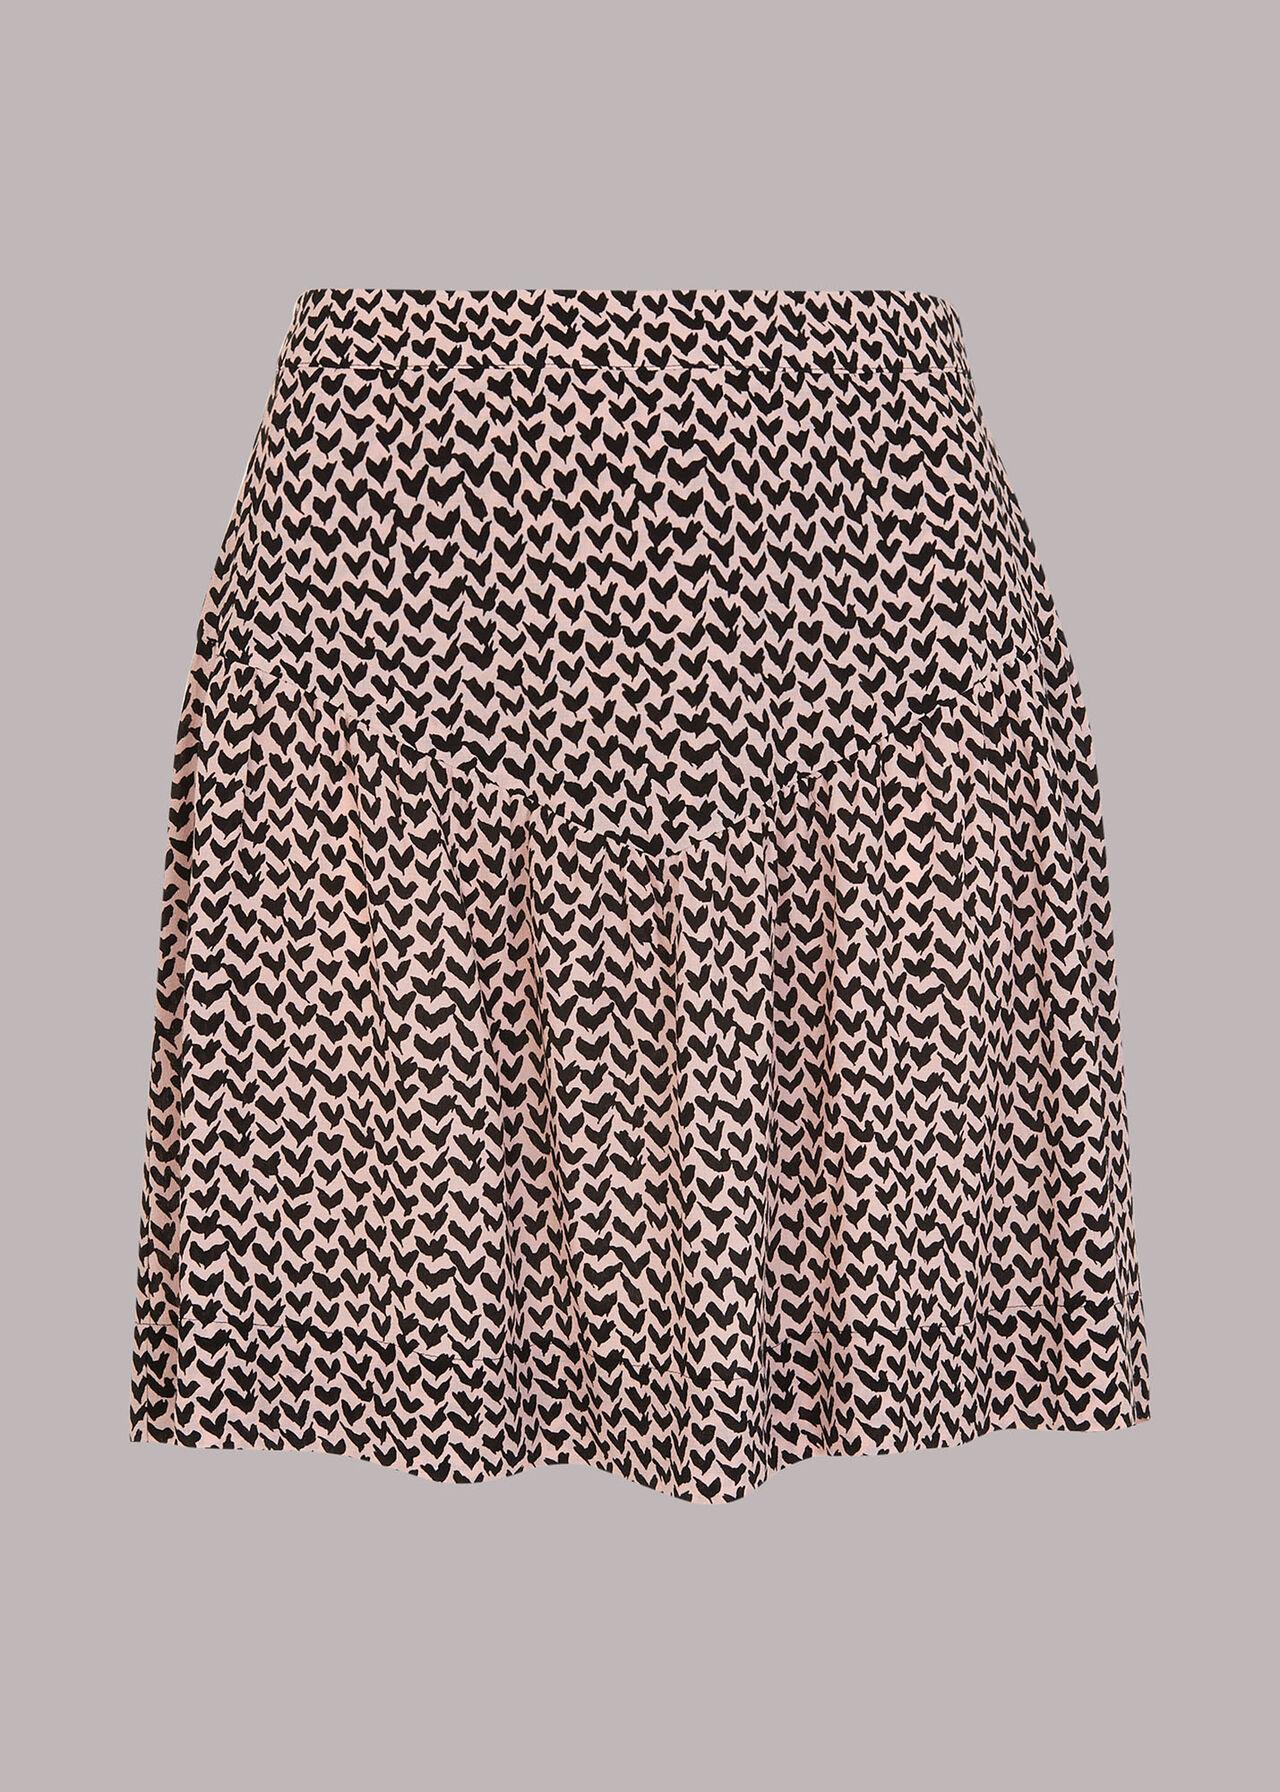 Abstract Heart Flippy Skirt